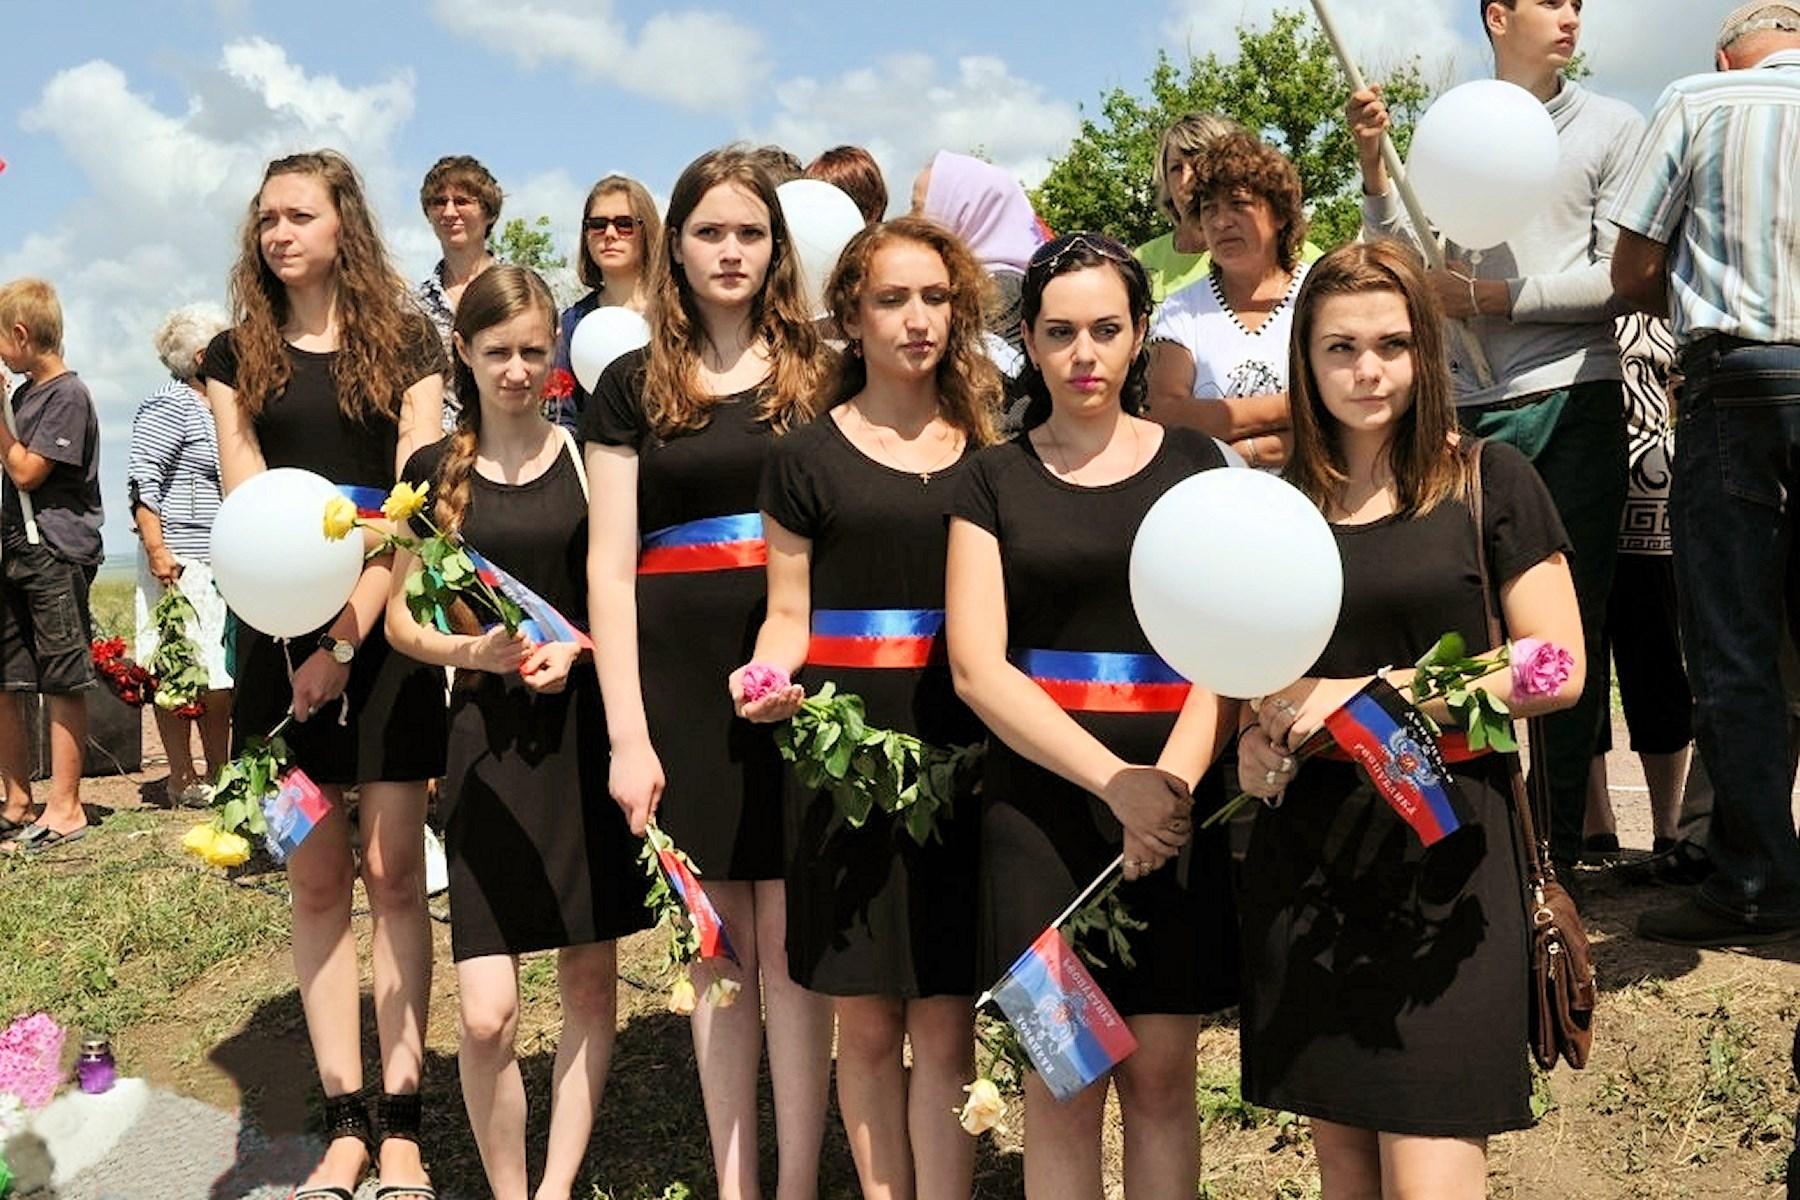 00 mh17 memorial 06. dnr. donetsk pr. 170715